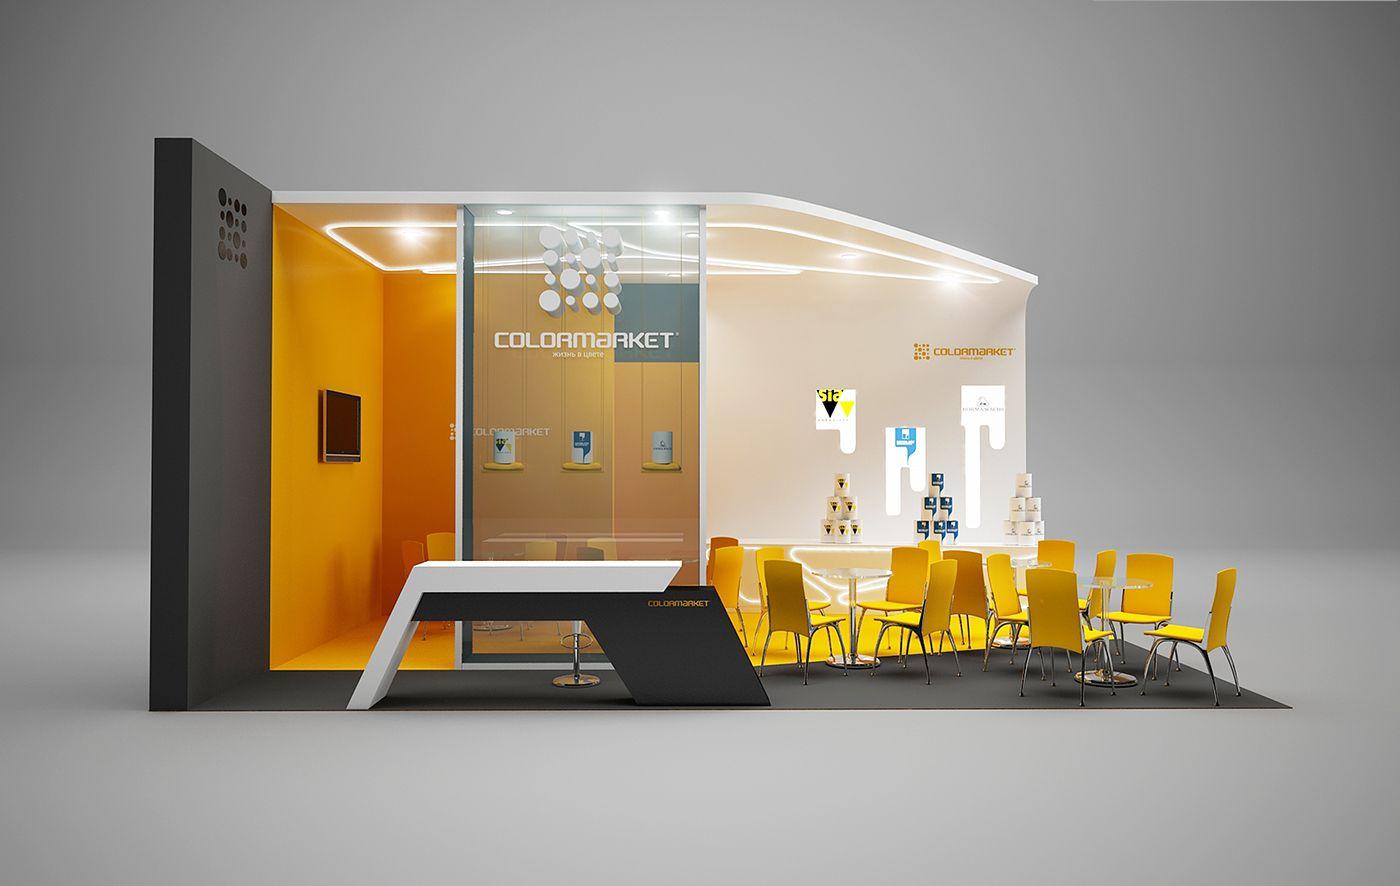 Gm Exhibition Stand Design : Gm stand design